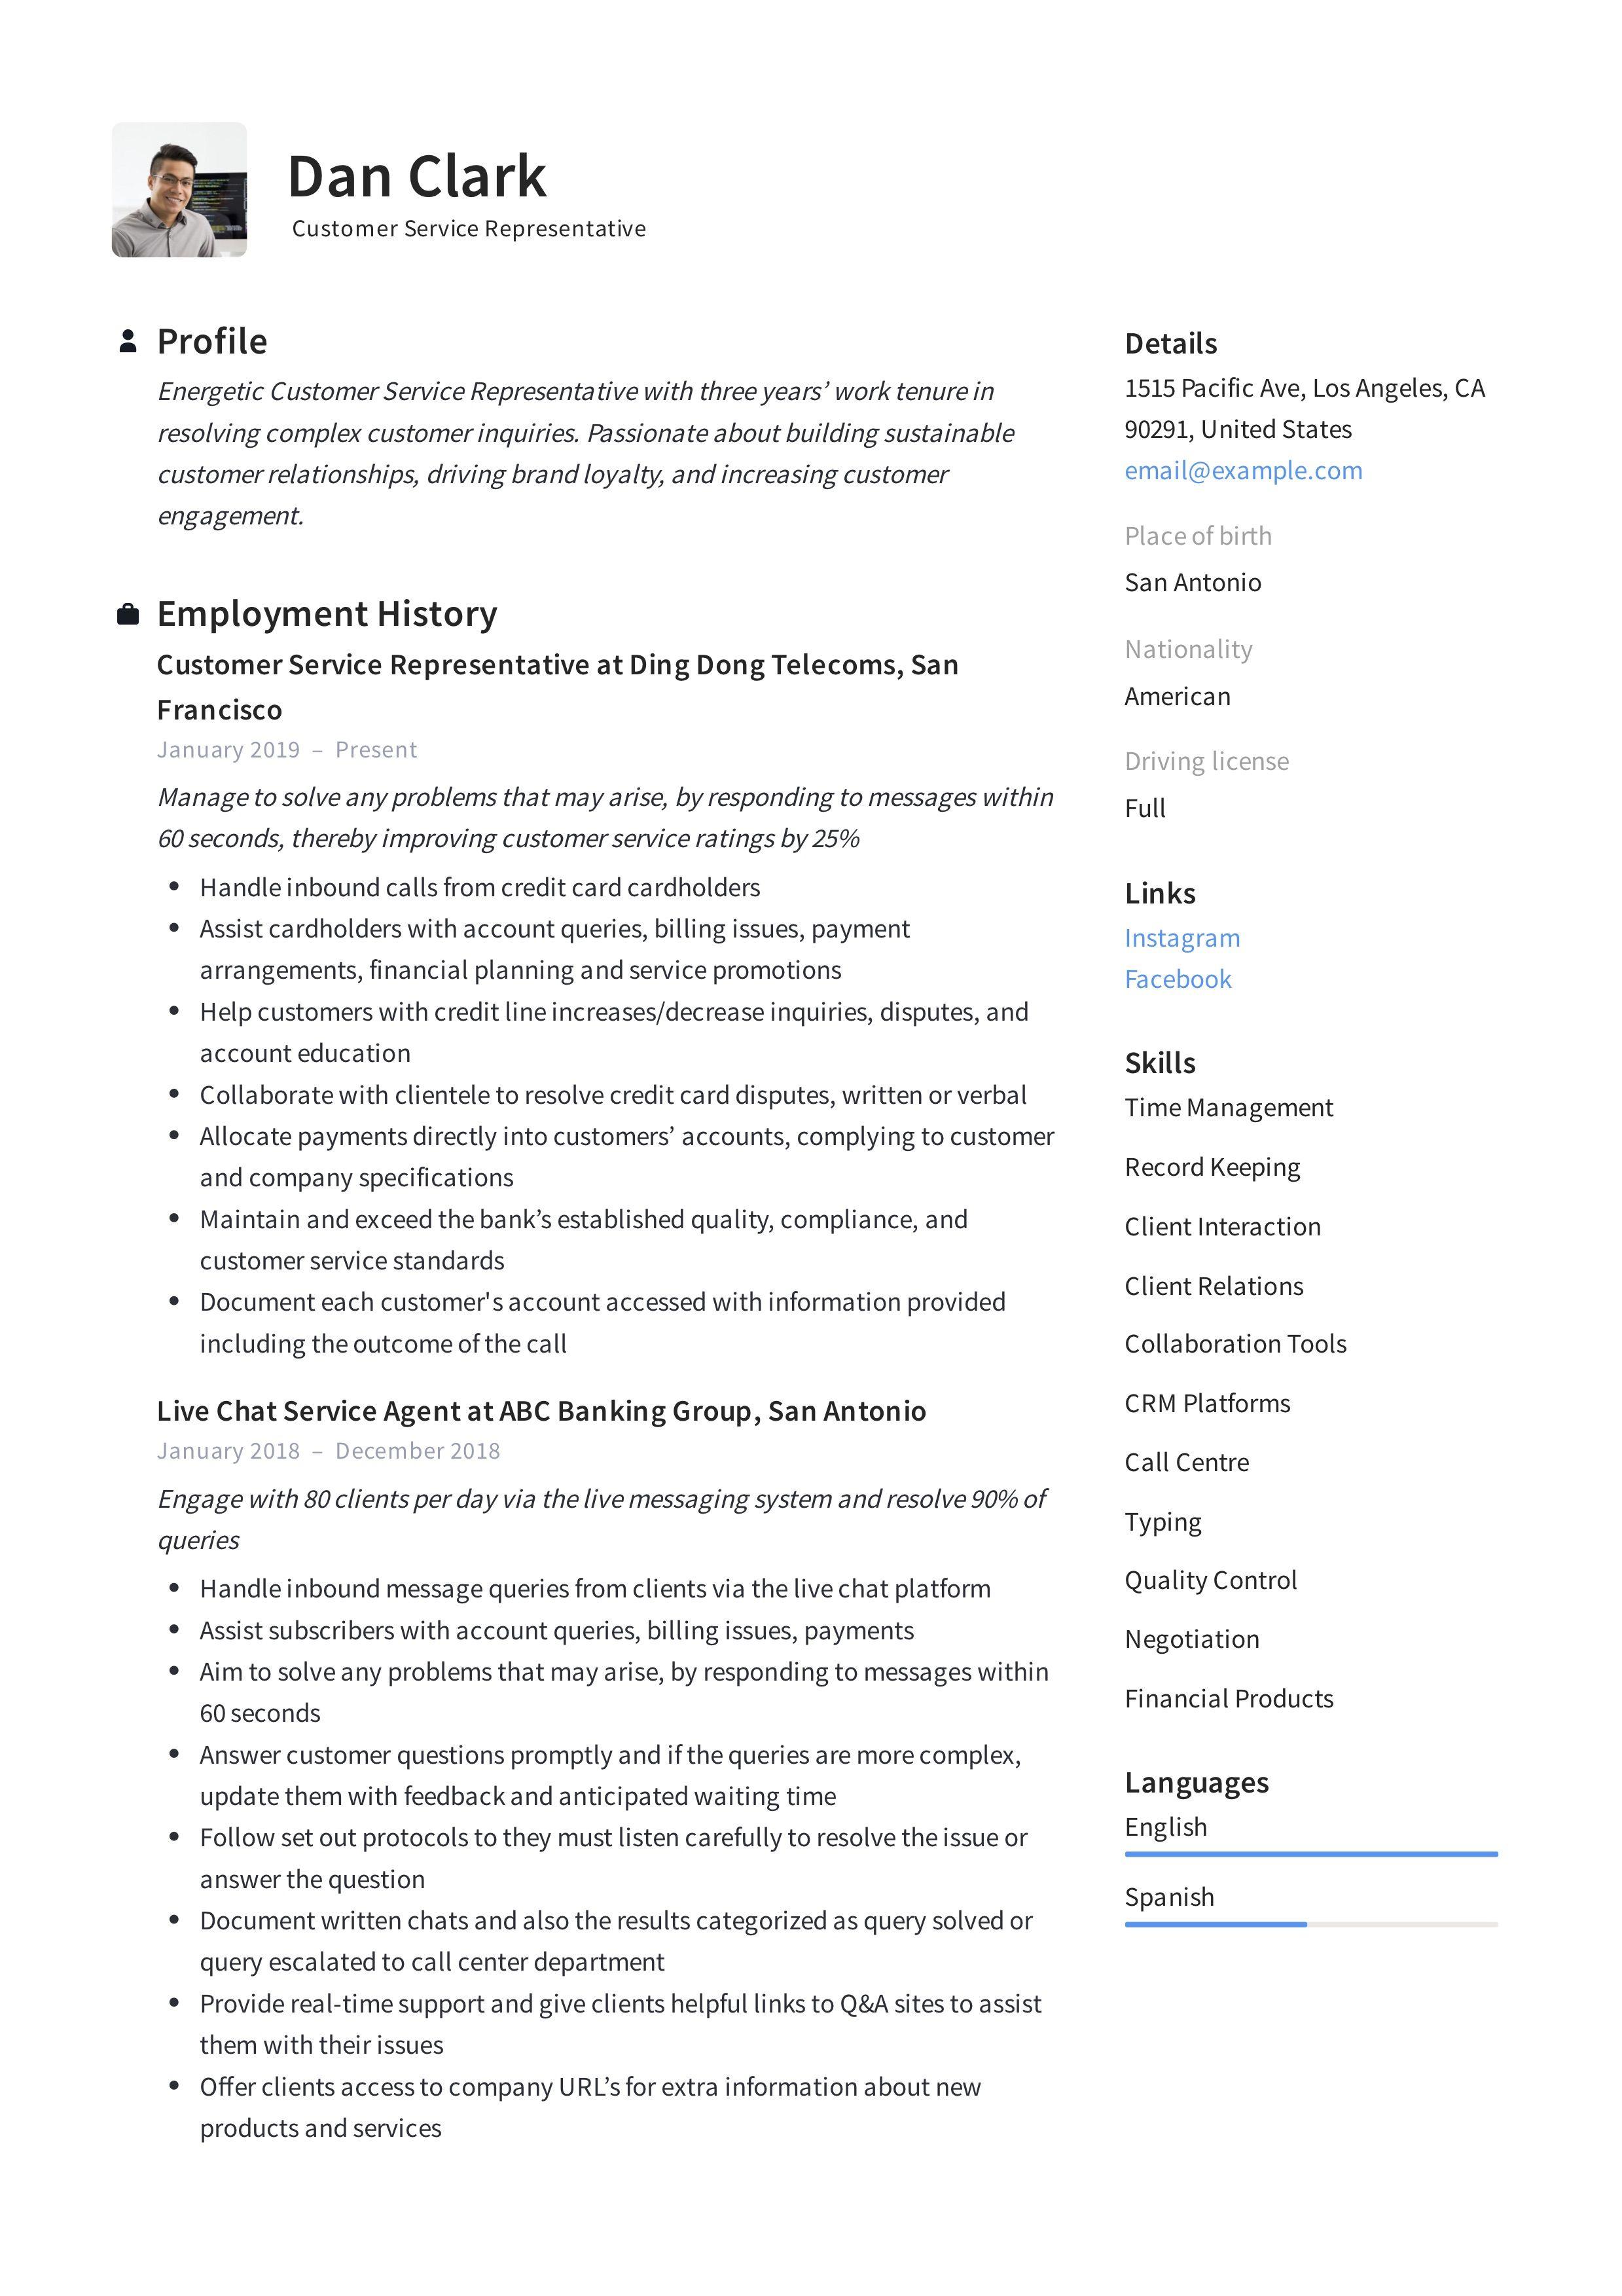 Customer Service Representative Resume Template Customer Service Resume Customer Service Resume Examples Customer Service Cover Letter